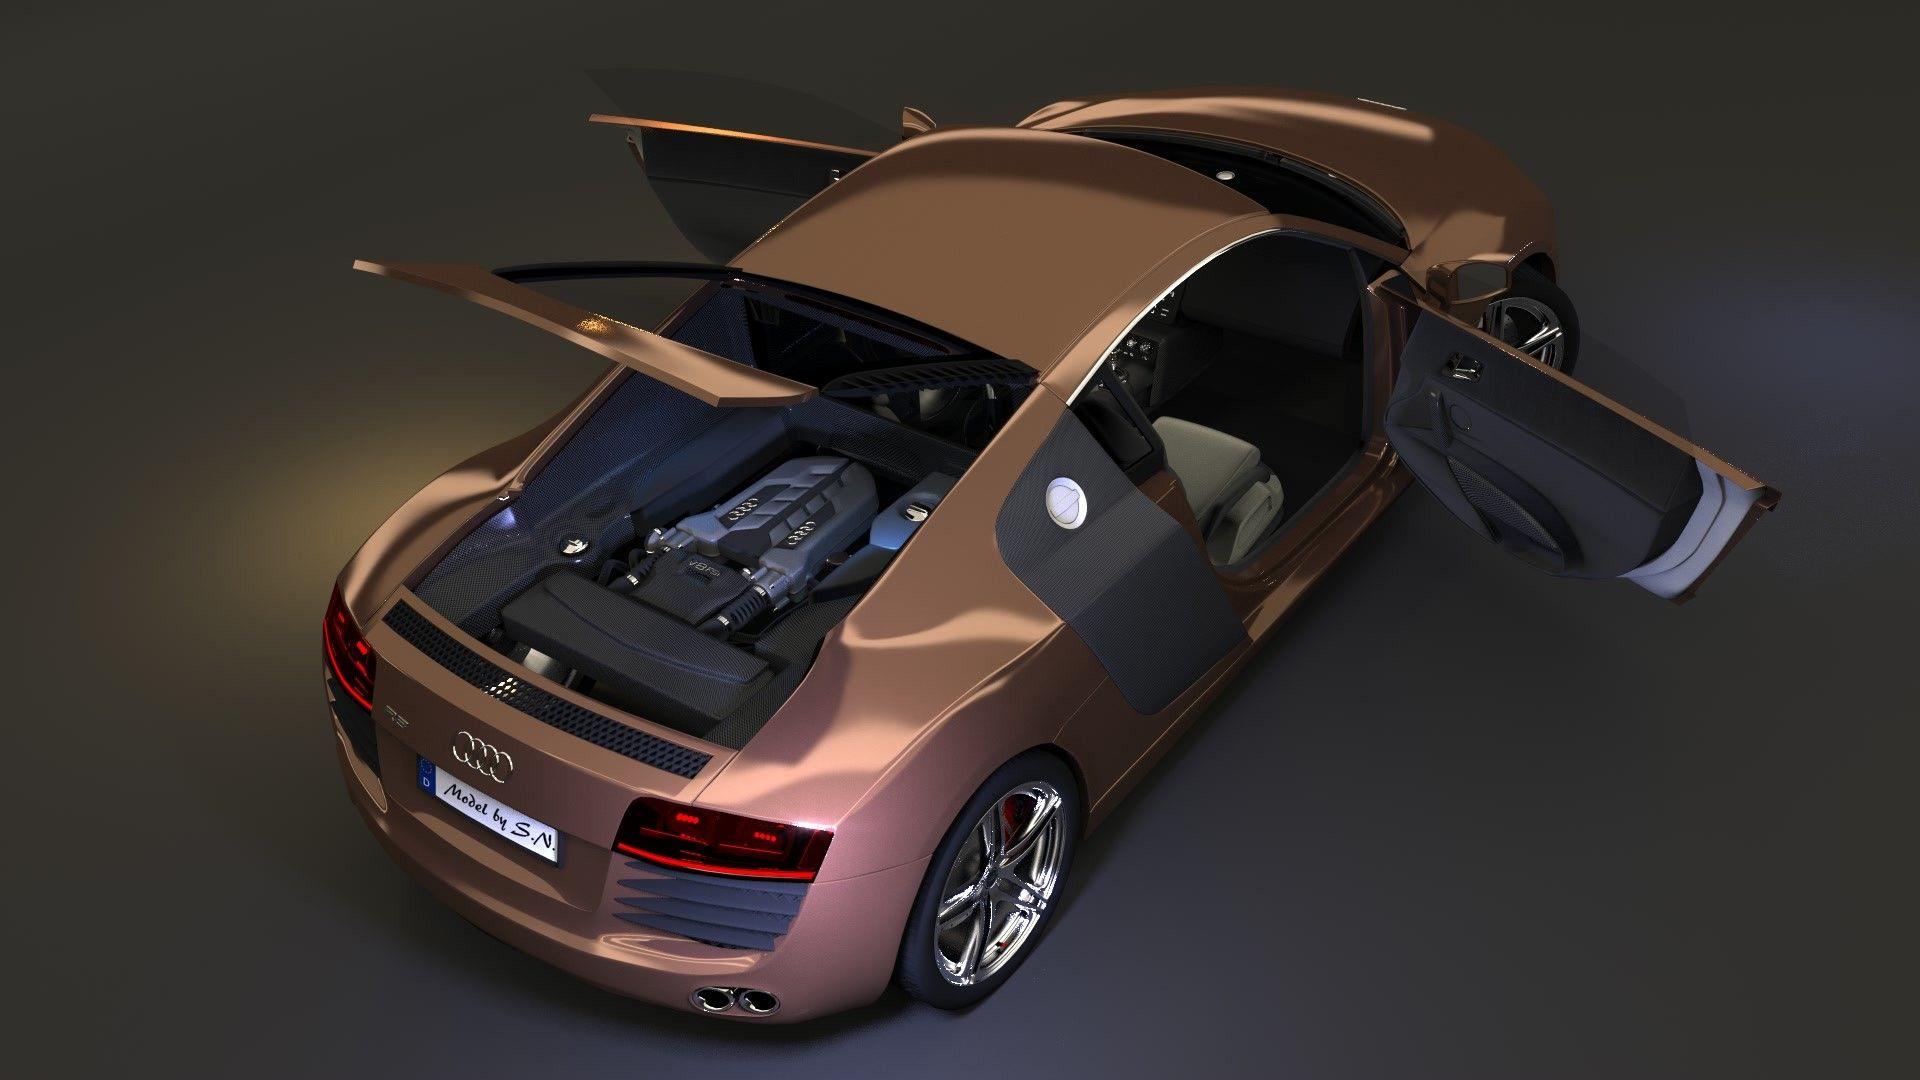 D Audi R Car Model Car Pinterest R Car And Cars - Audi car 3d games